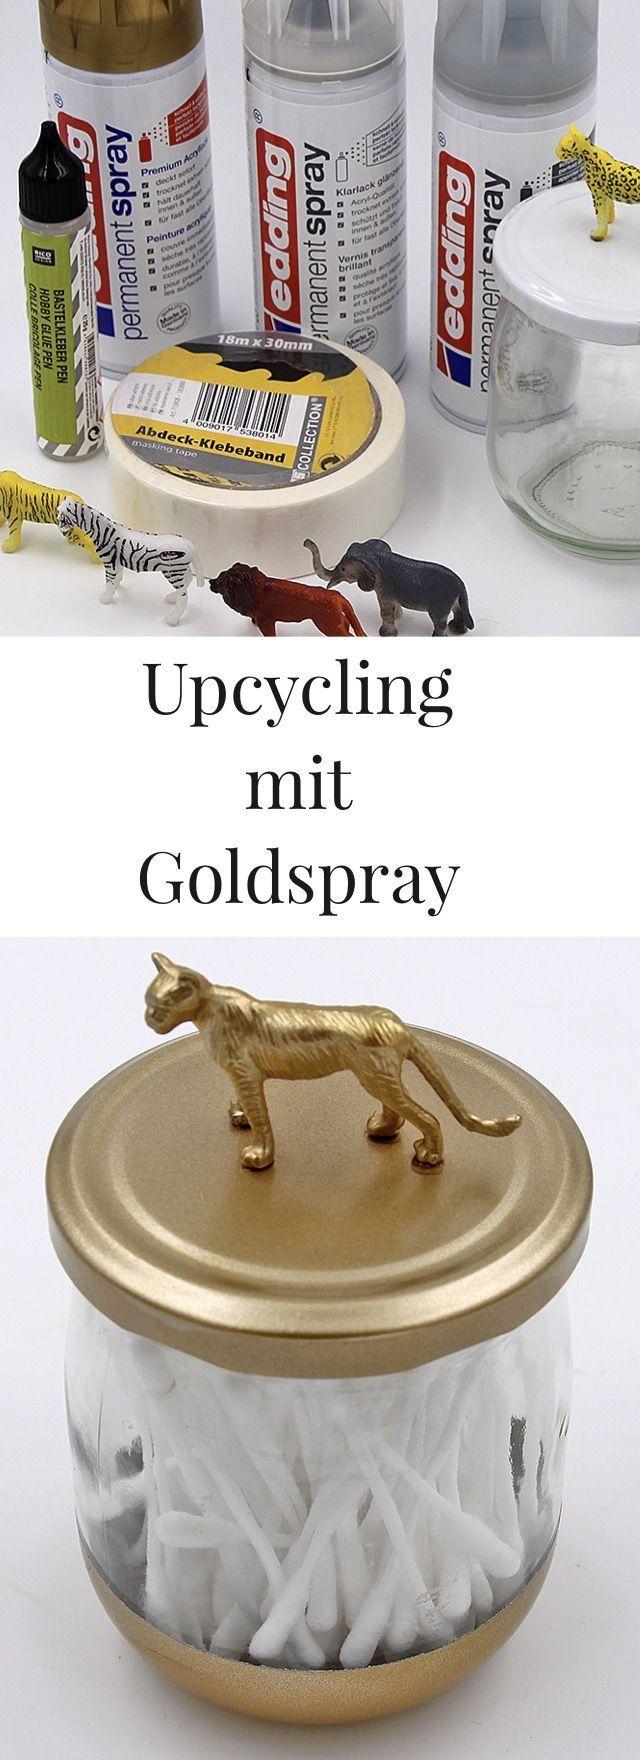 Deko selber machen - schöne Upcycling Idee aus Gläsern – Happy Dings – Happiness & DIY Blog #upcyclingideen